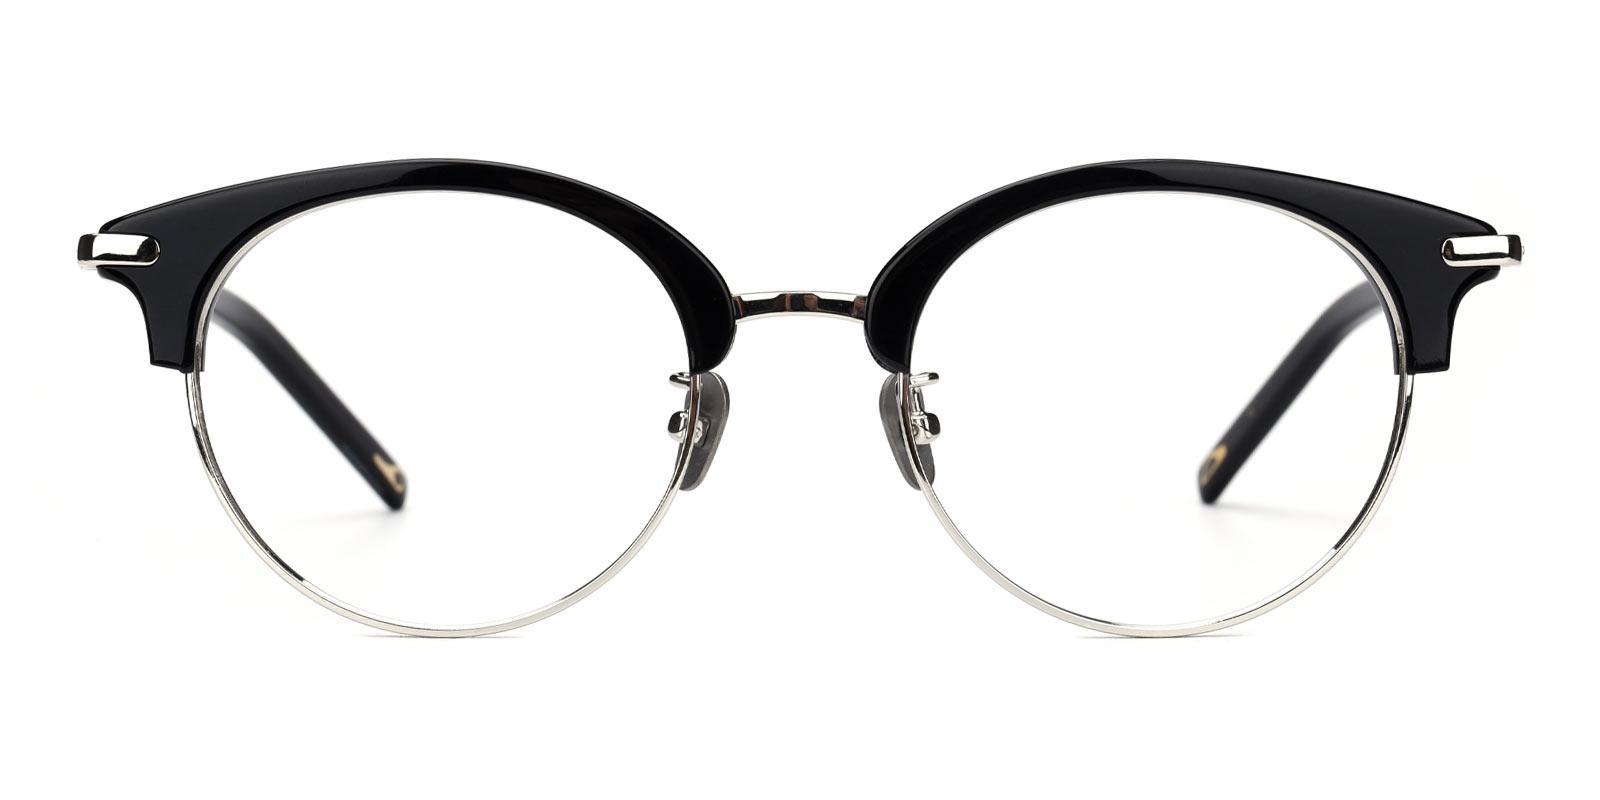 Jodie-Black-Browline-Titanium-Eyeglasses-additional2